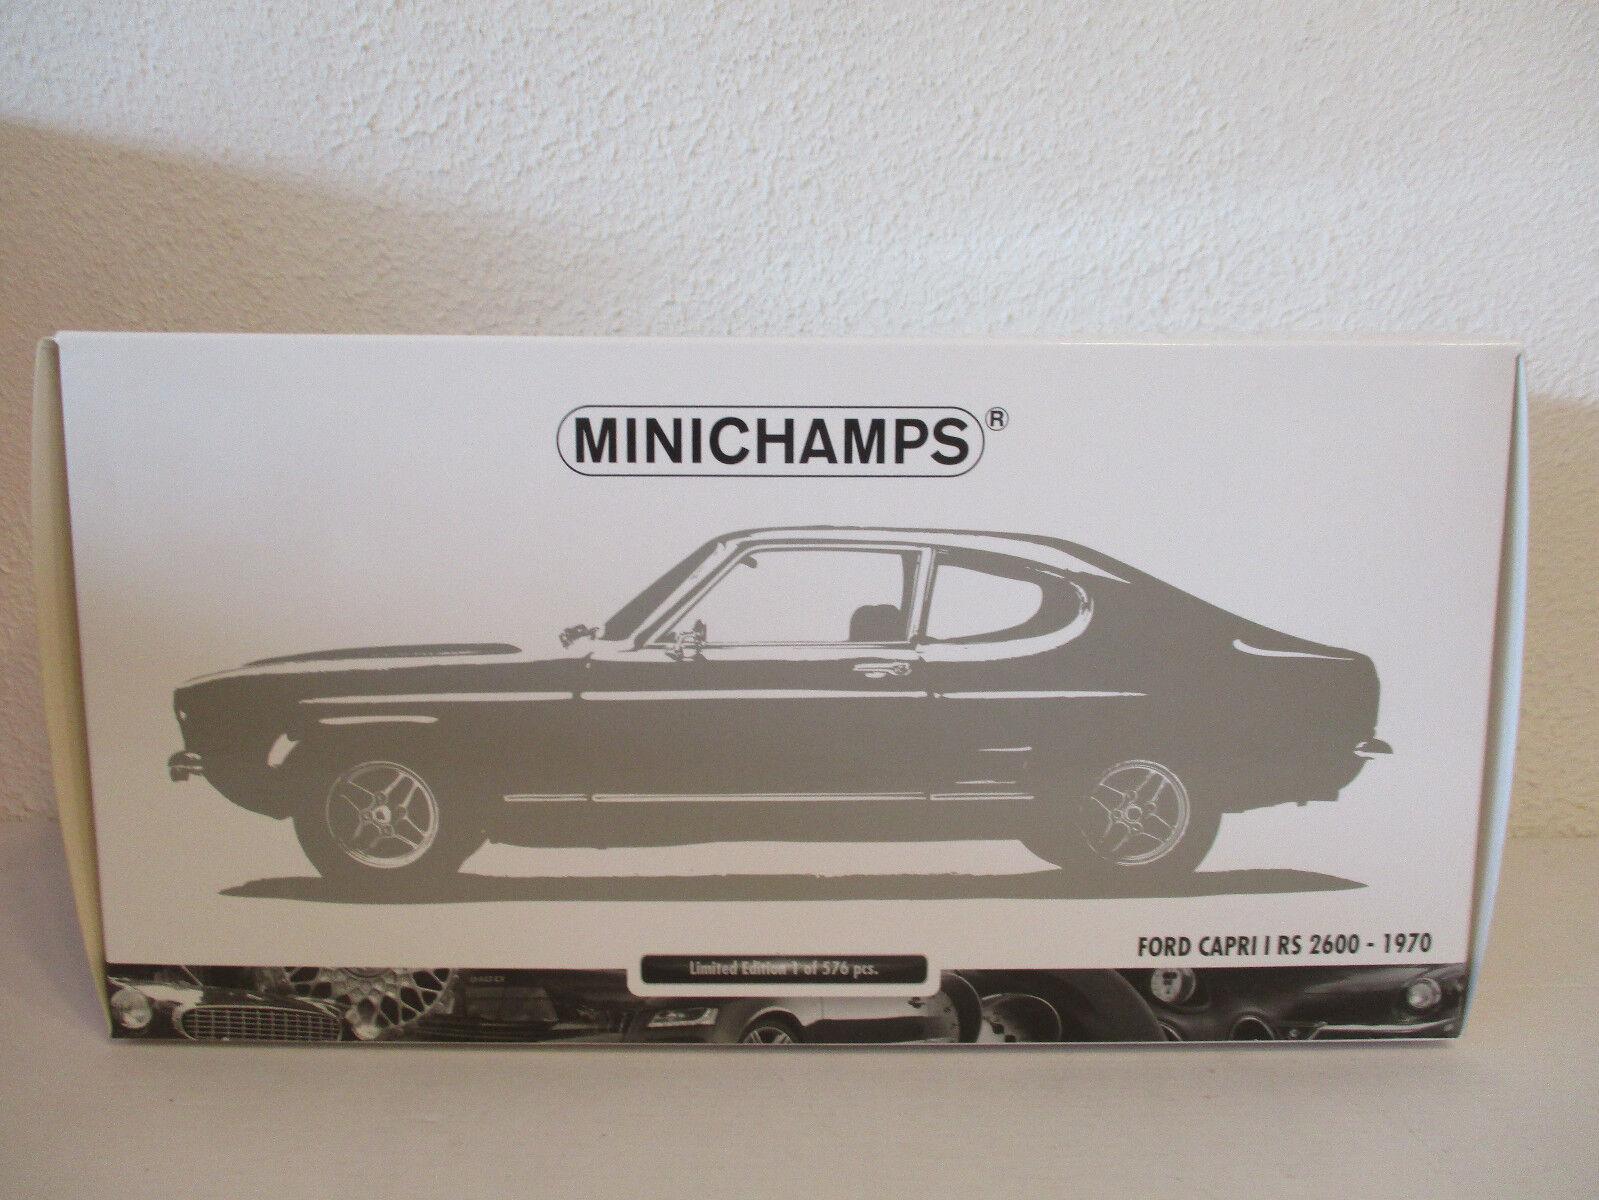 (Gol) 1 18 Minichamps Ford Capri I R 2600 1970 Nip